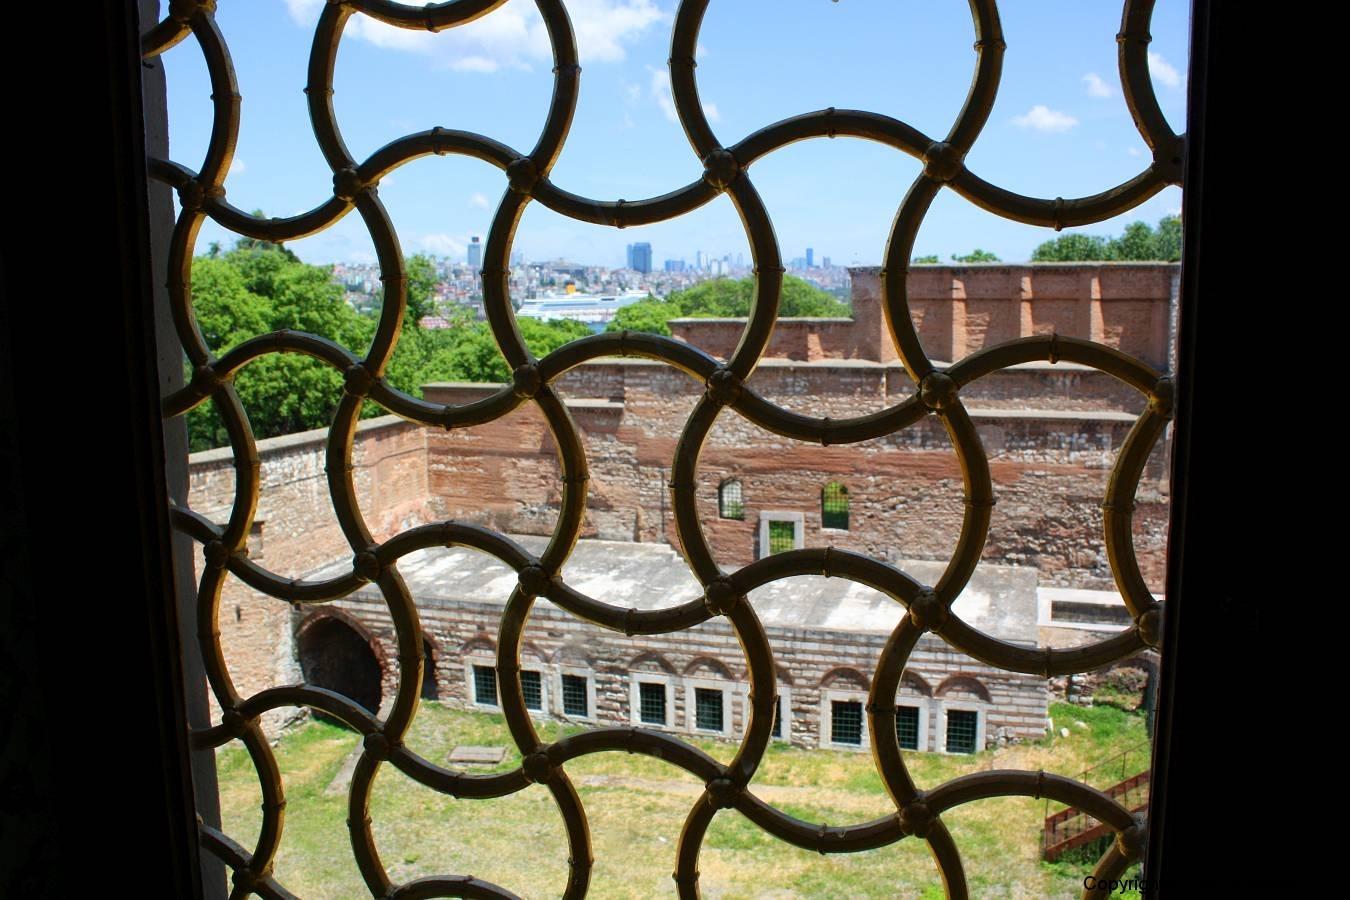 Istanbul, Topkapi-Palast, im Harem, Blick durch ein vergittertes Fenster